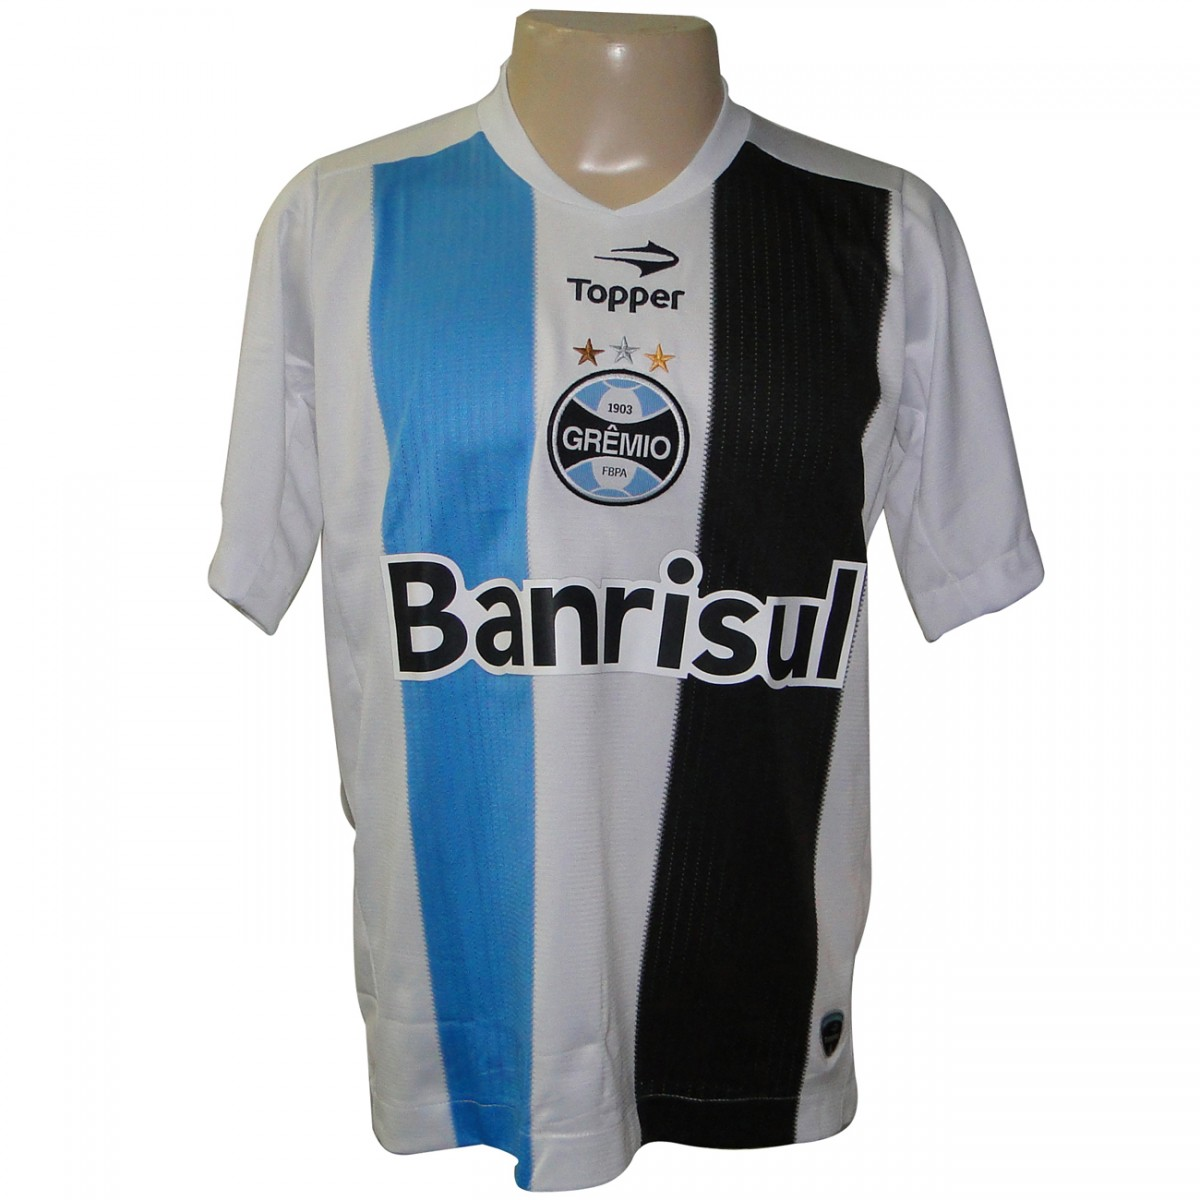 CAMISA GREMIO TOPPER 2011 3200 - BRANCO - Chuteira Nike 2311b392c87e8